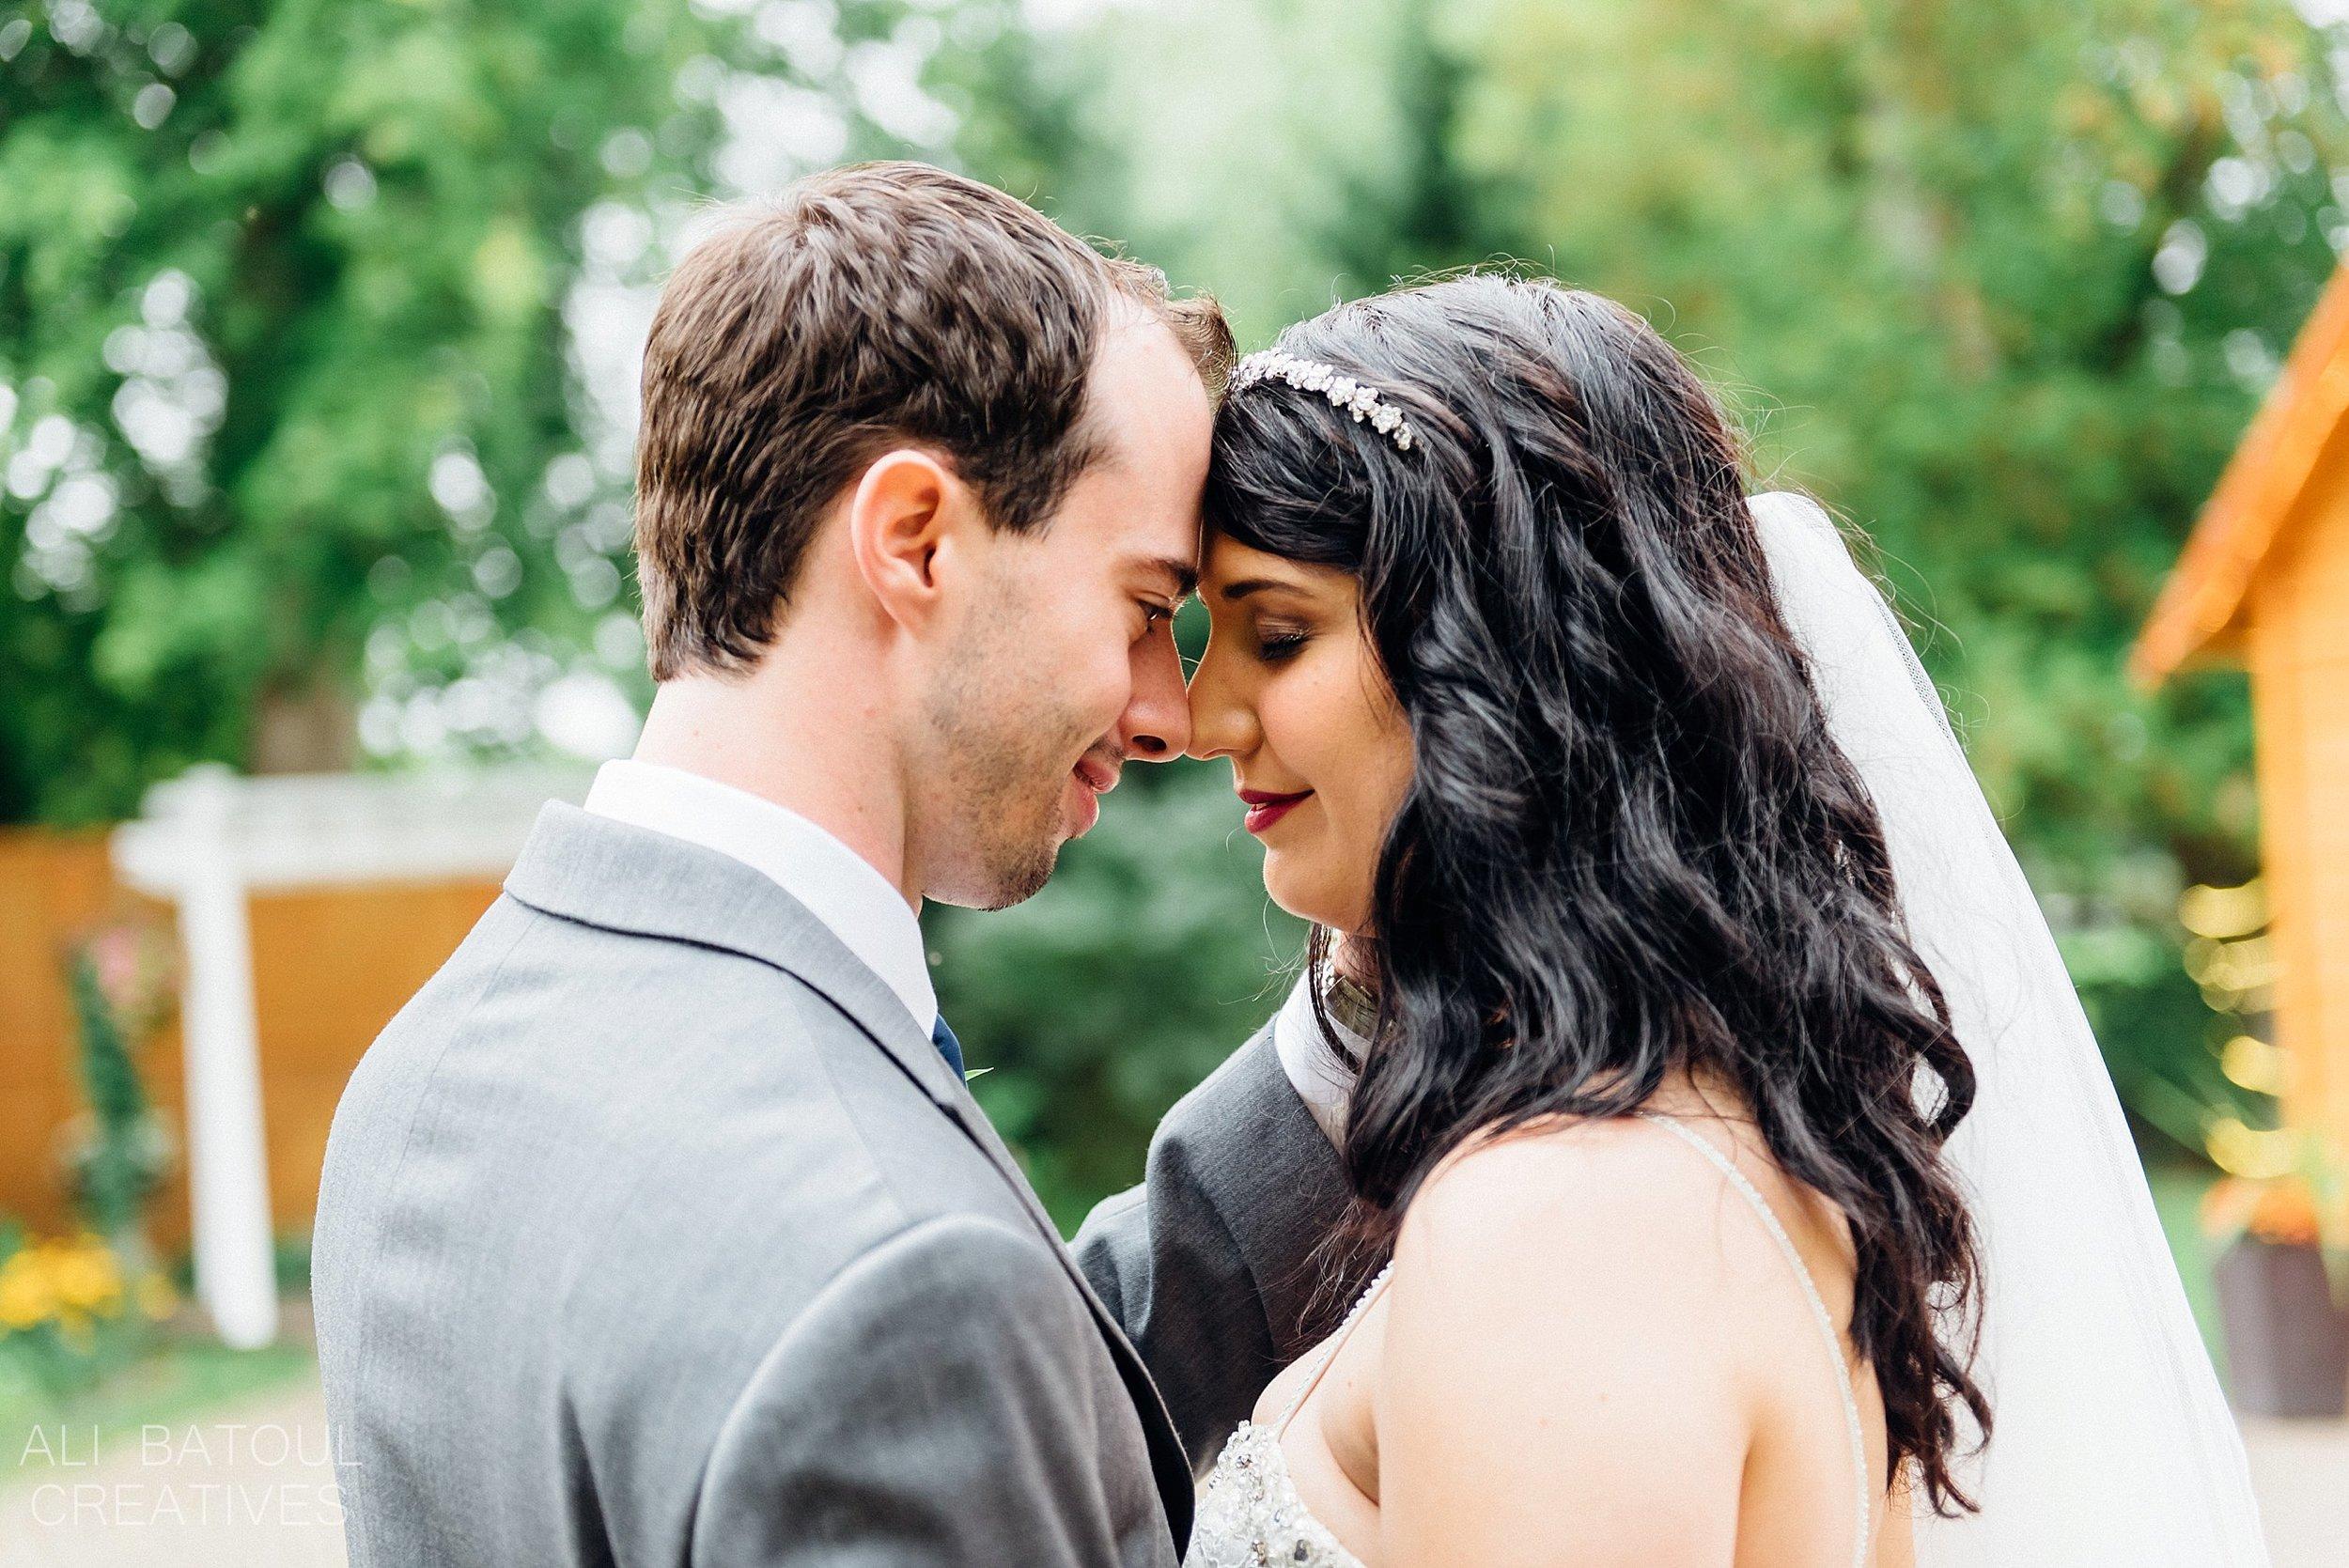 Jocelyn + Steve At The Schoolhouse Wedding - Ali and Batoul Fine Art Wedding Photography_0038.jpg